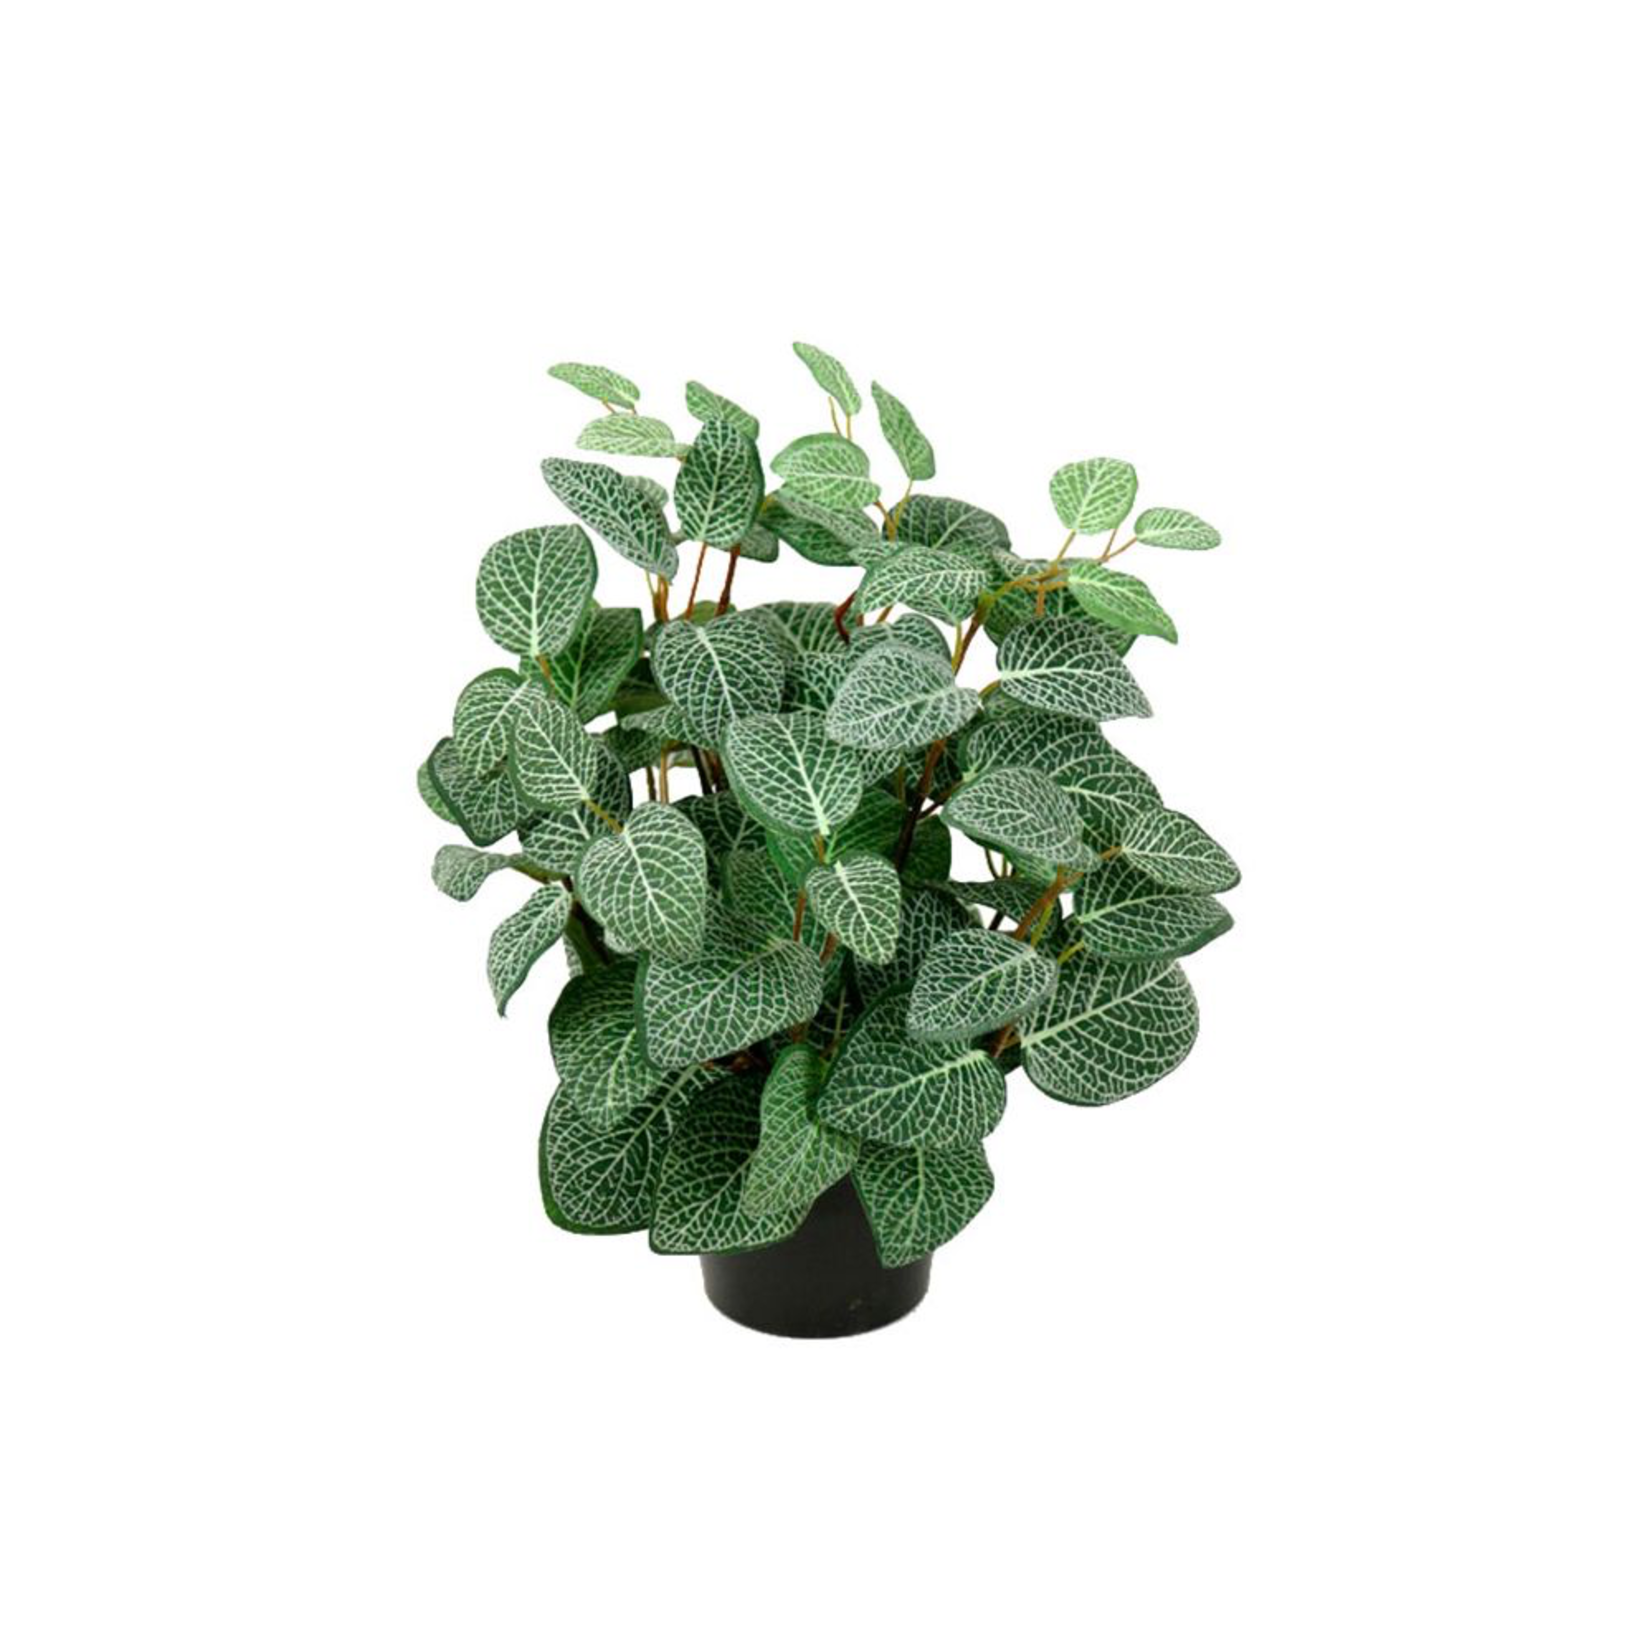 Grand Interiors Fittonia Artificial Plant H 34cm W 25cm 10cm Pot